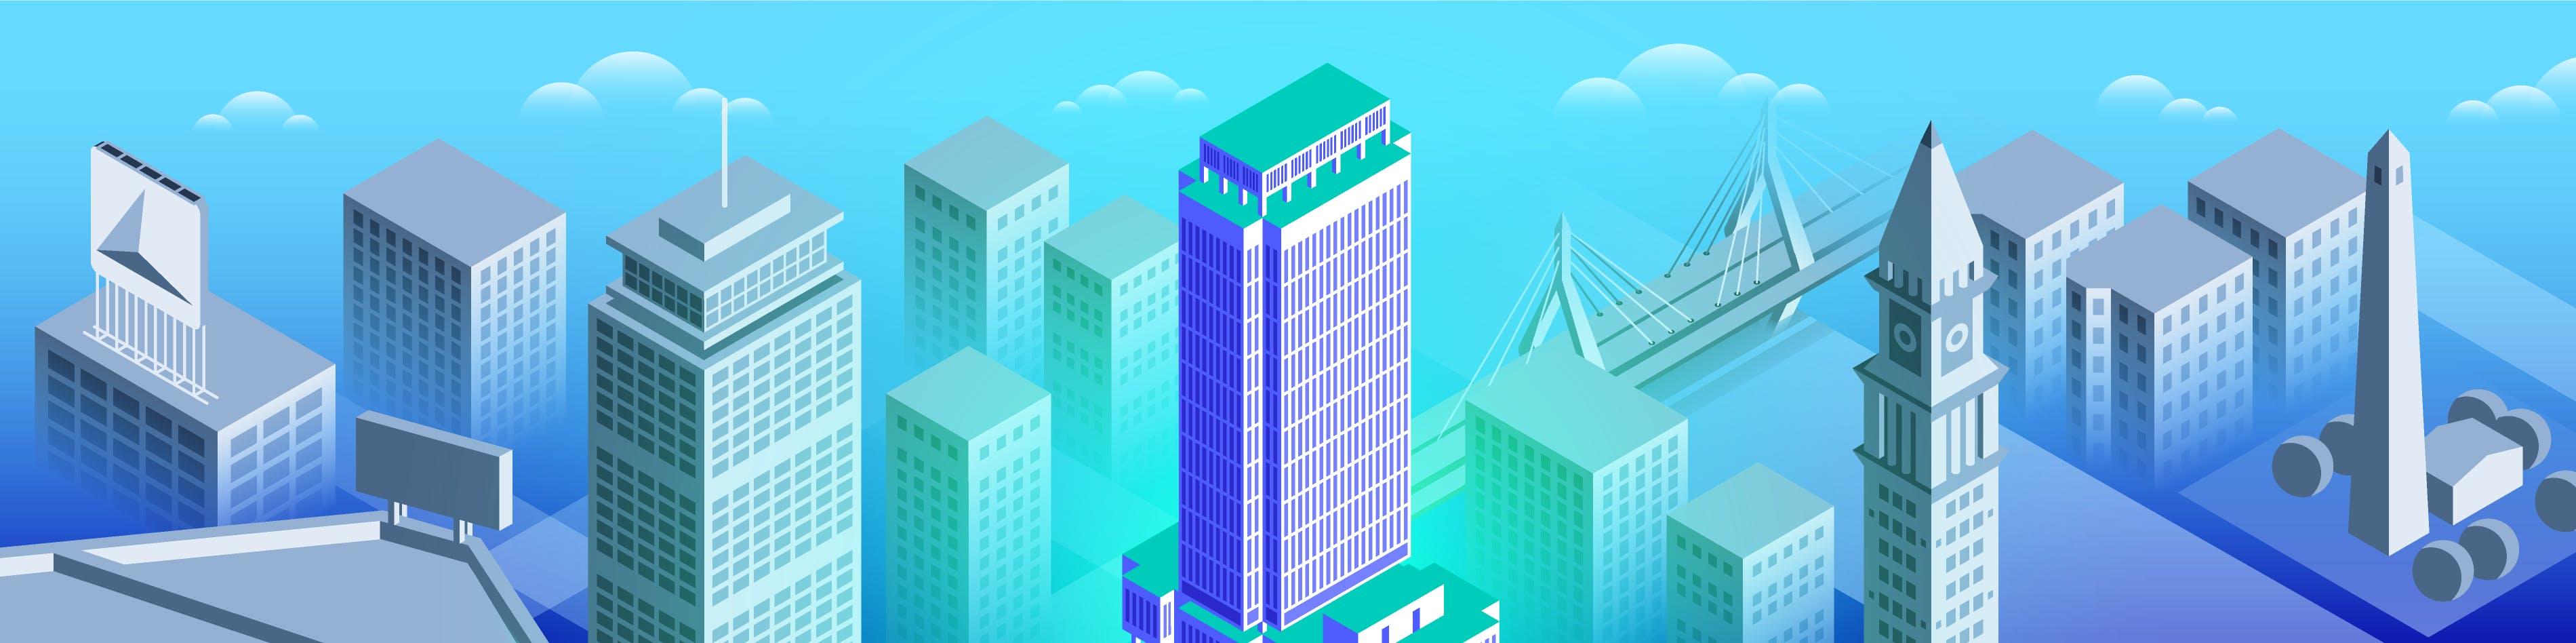 careers/datadog_office_skyline_190417_boston.png